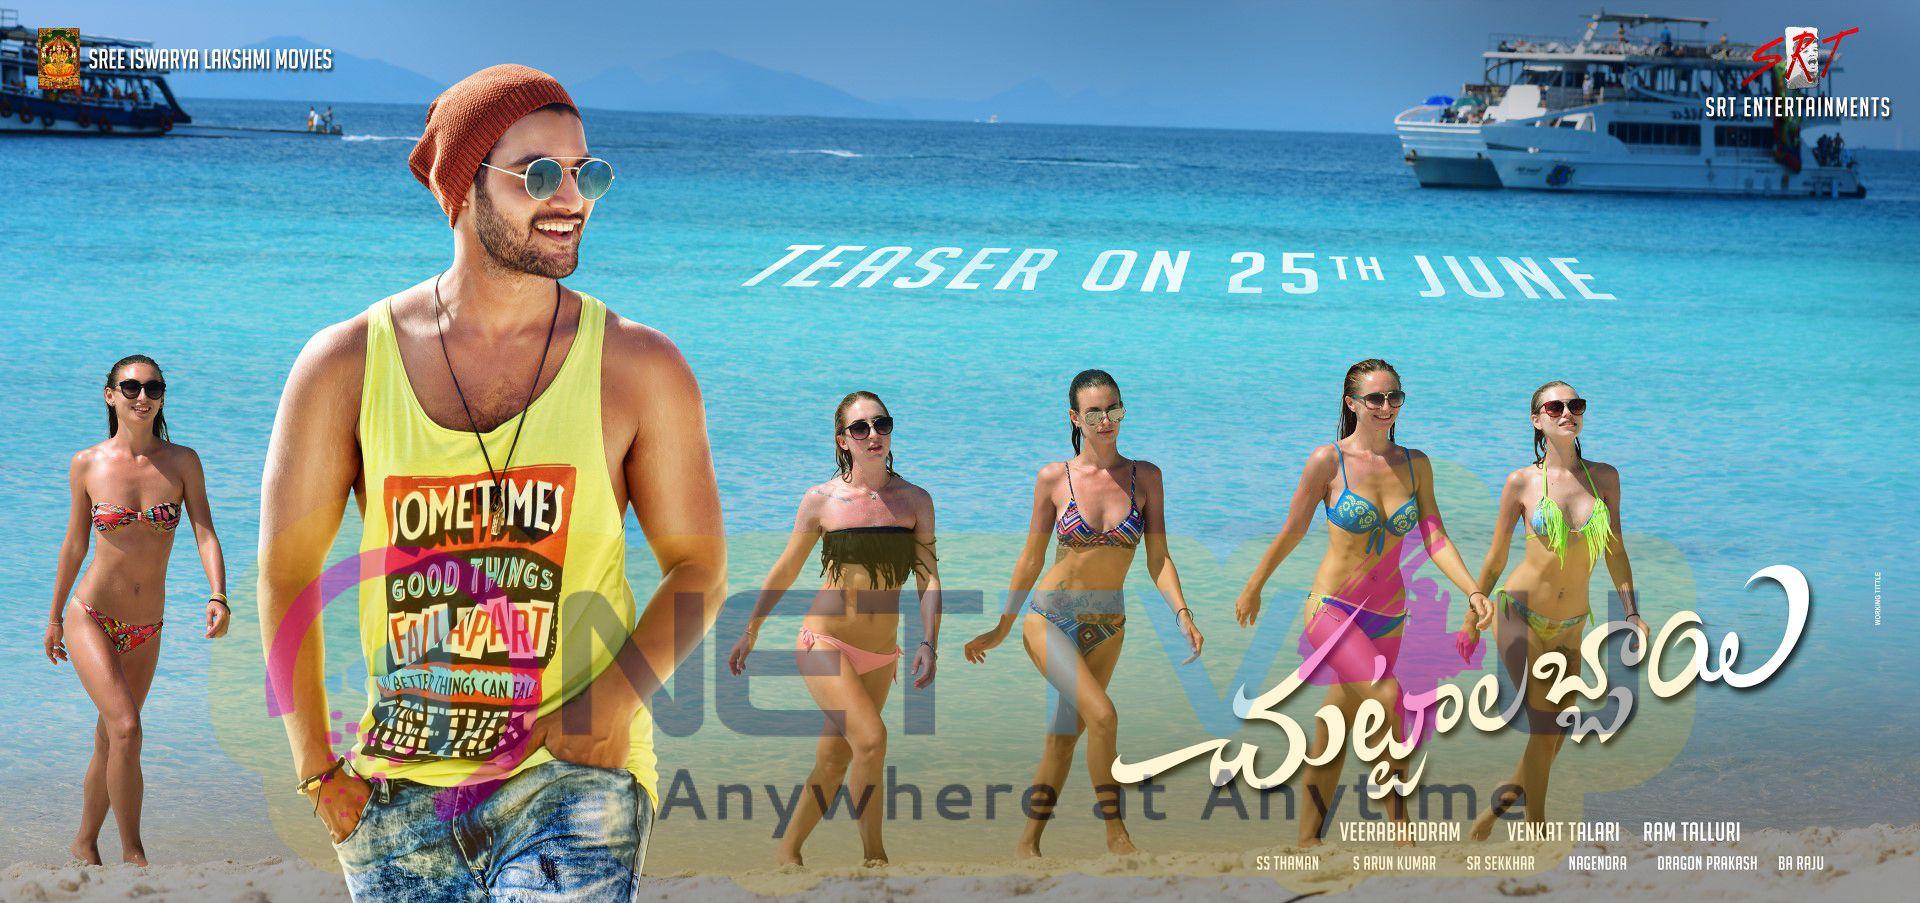 Telugu Movie Chuttalabbayi Attractive Posters